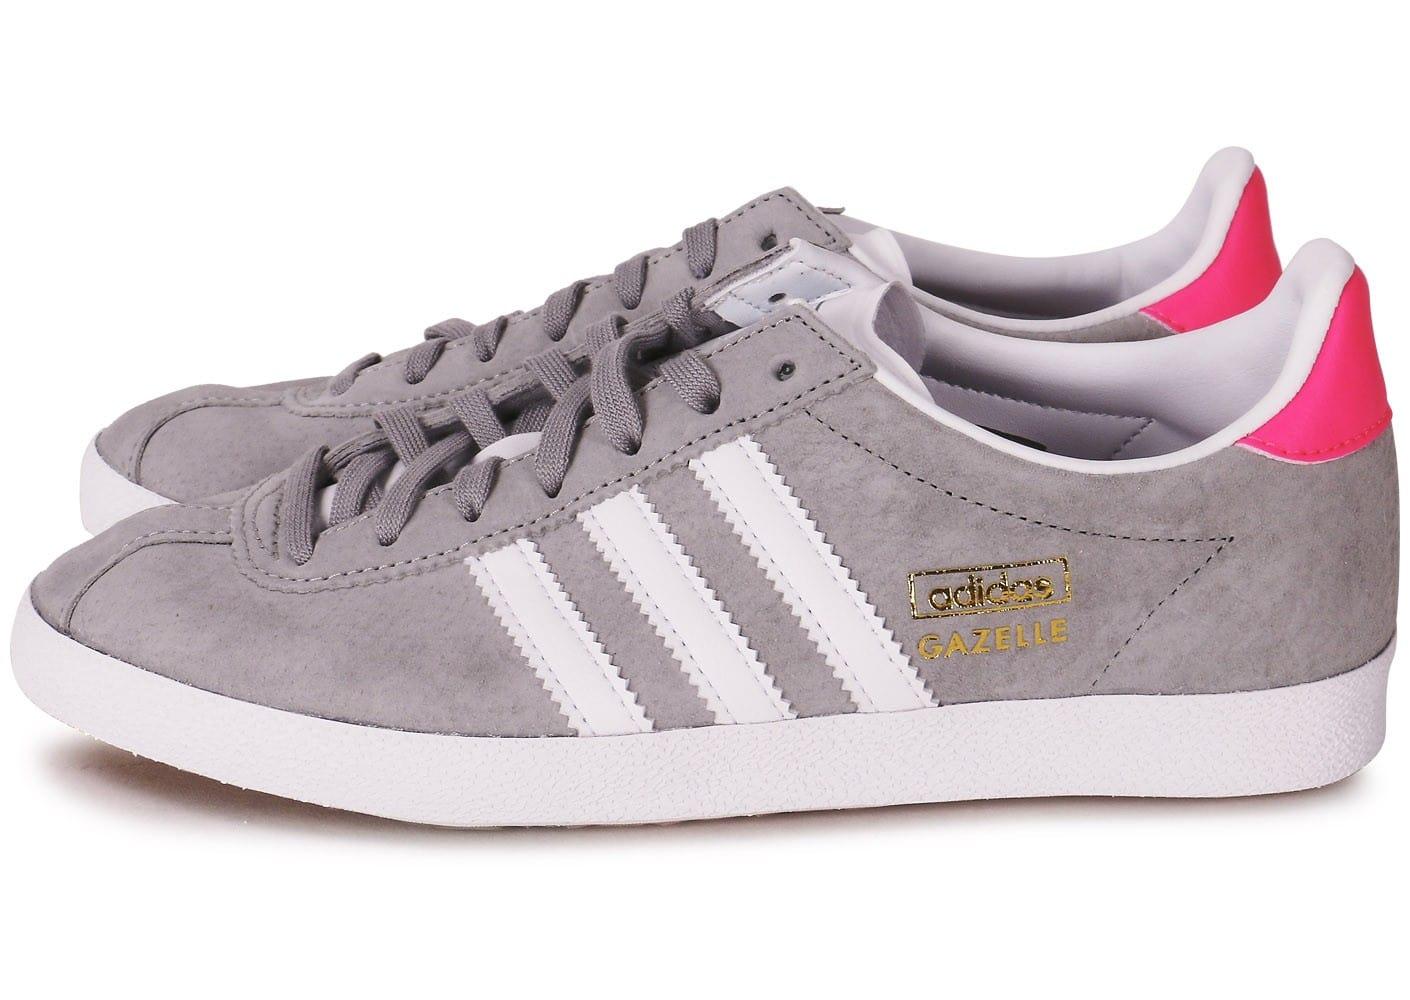 adidas gazelle gris rose,site de vente adidas gazelle gris rose pas ...